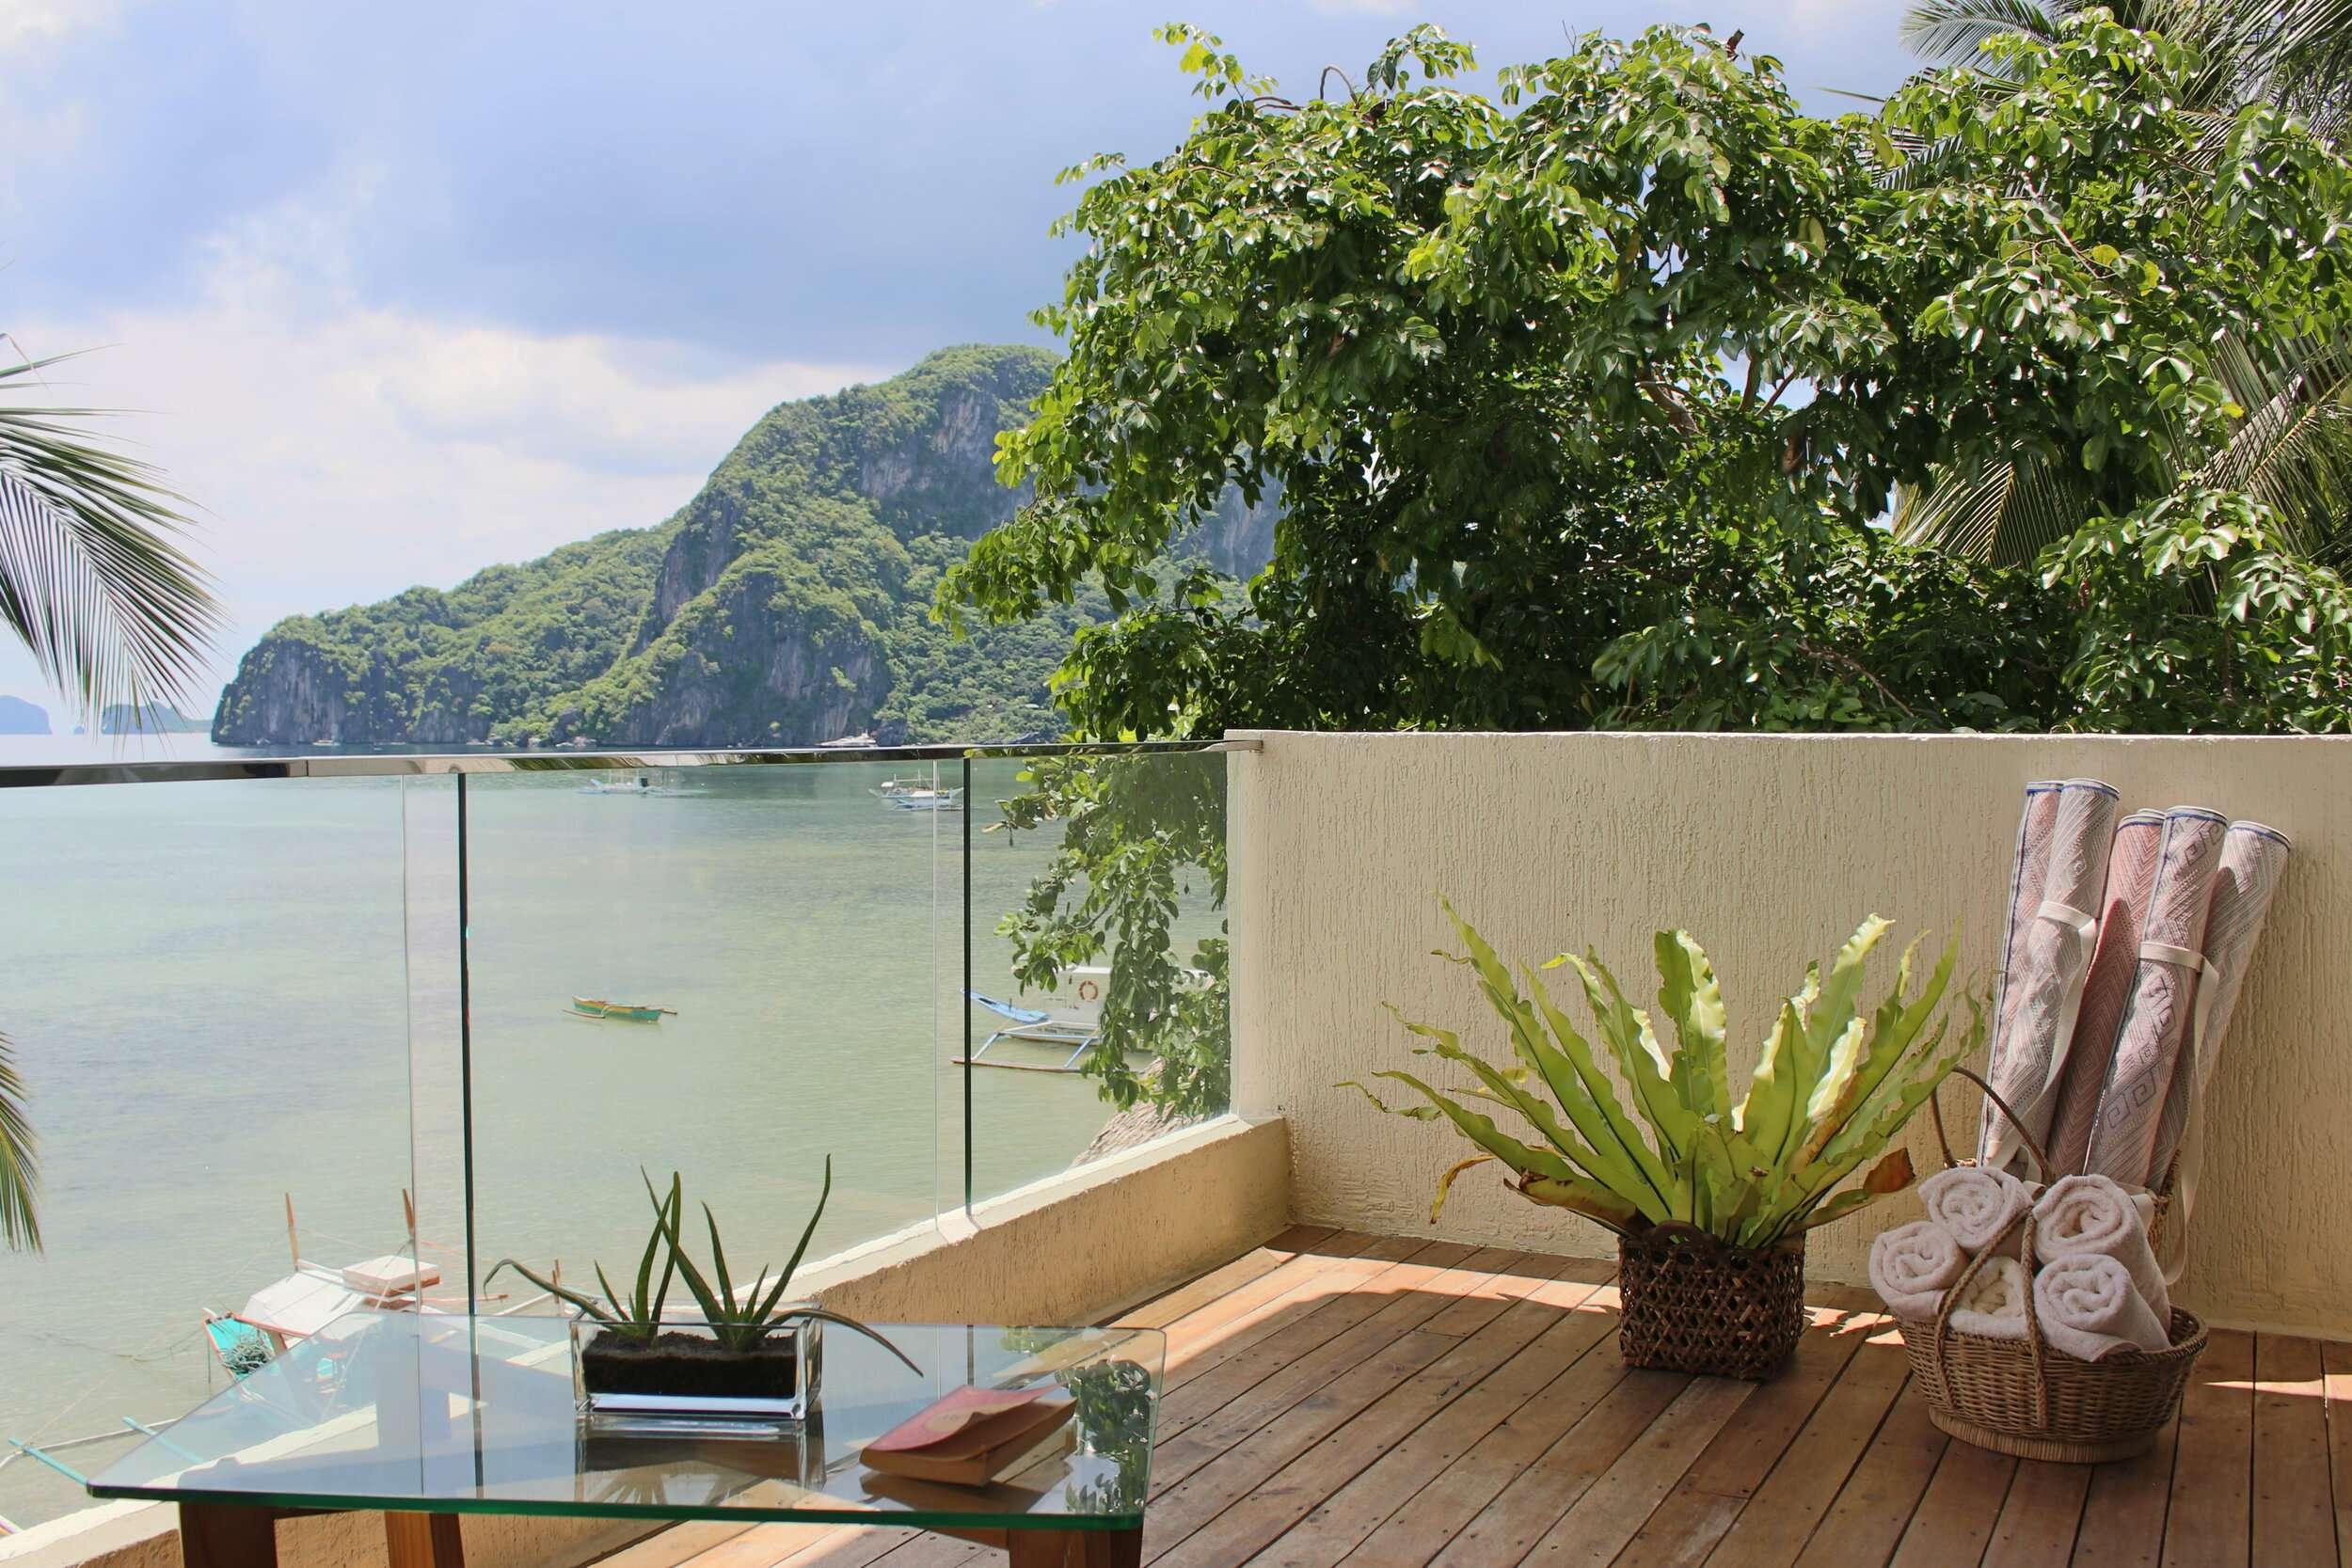 Frangipani El Nido Suite Balcony View